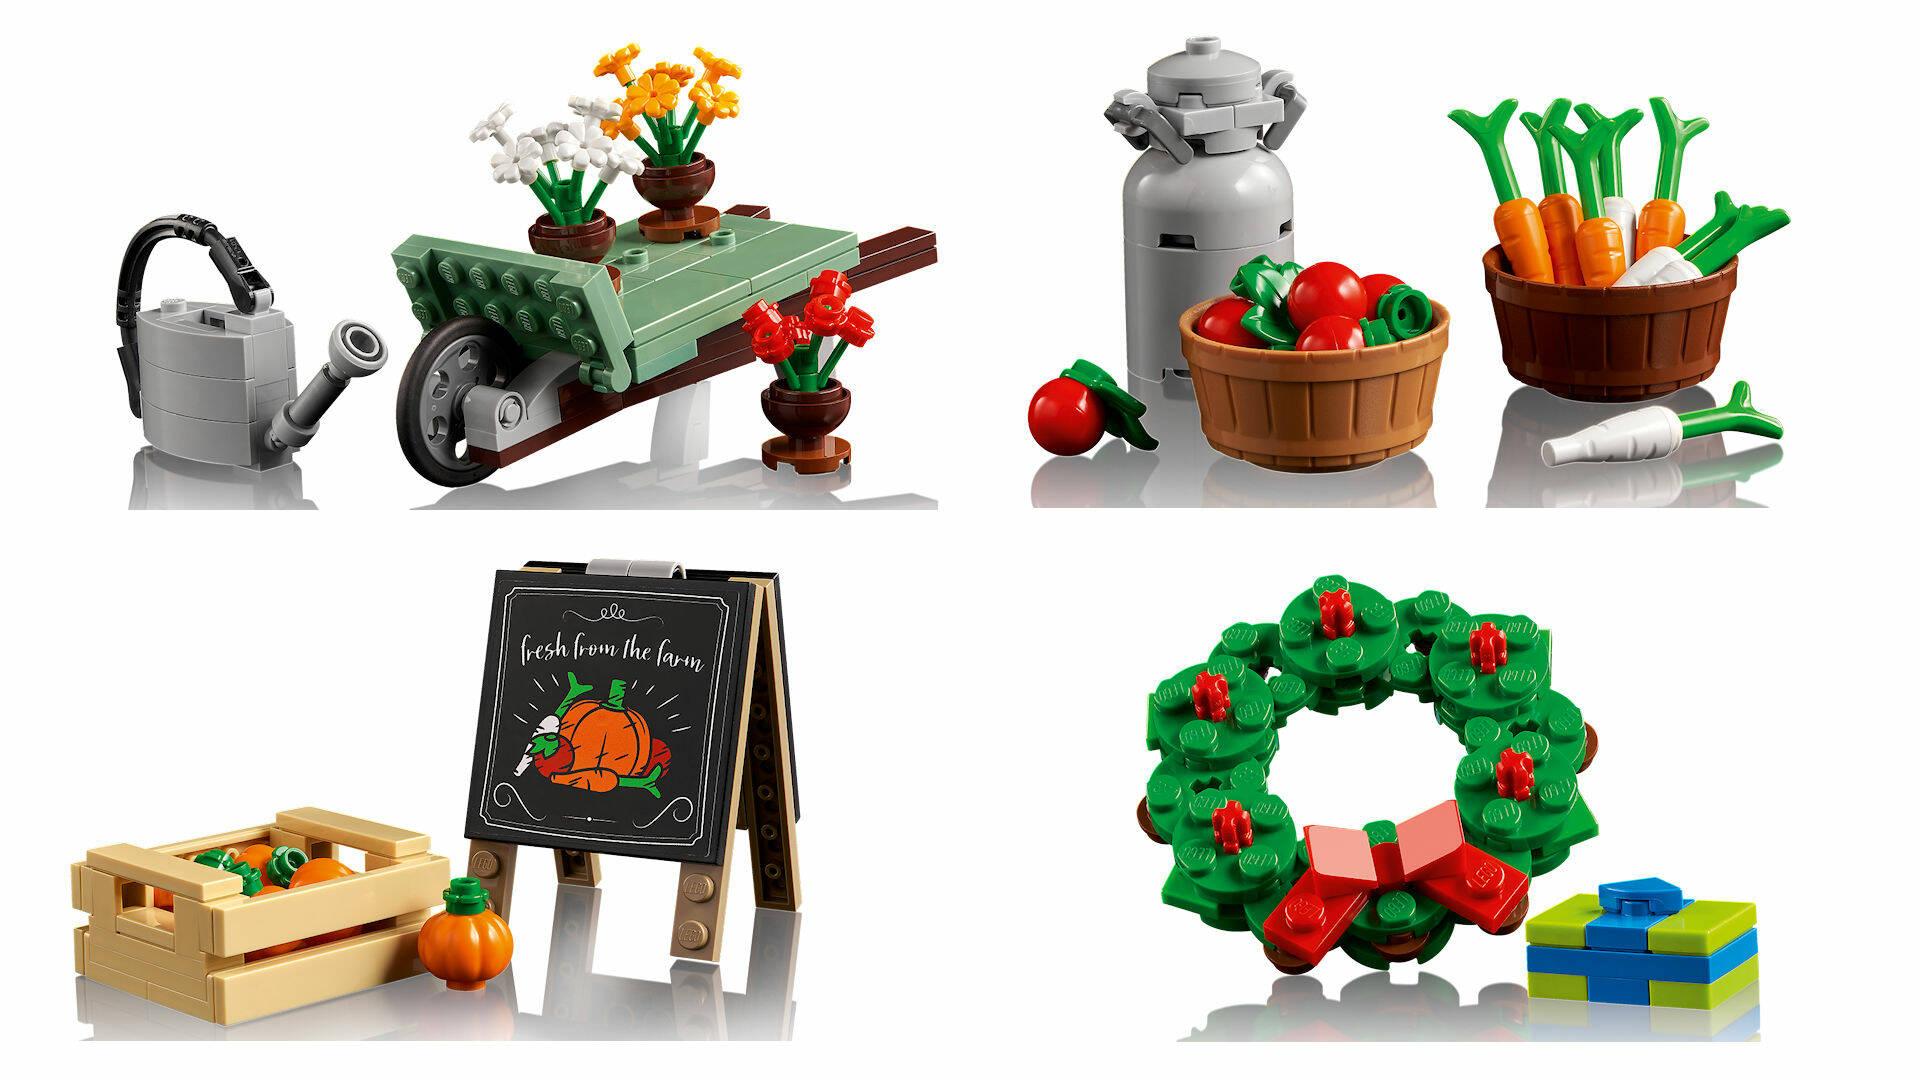 LEGO CREATOR EXPERT 10290 PICKUP